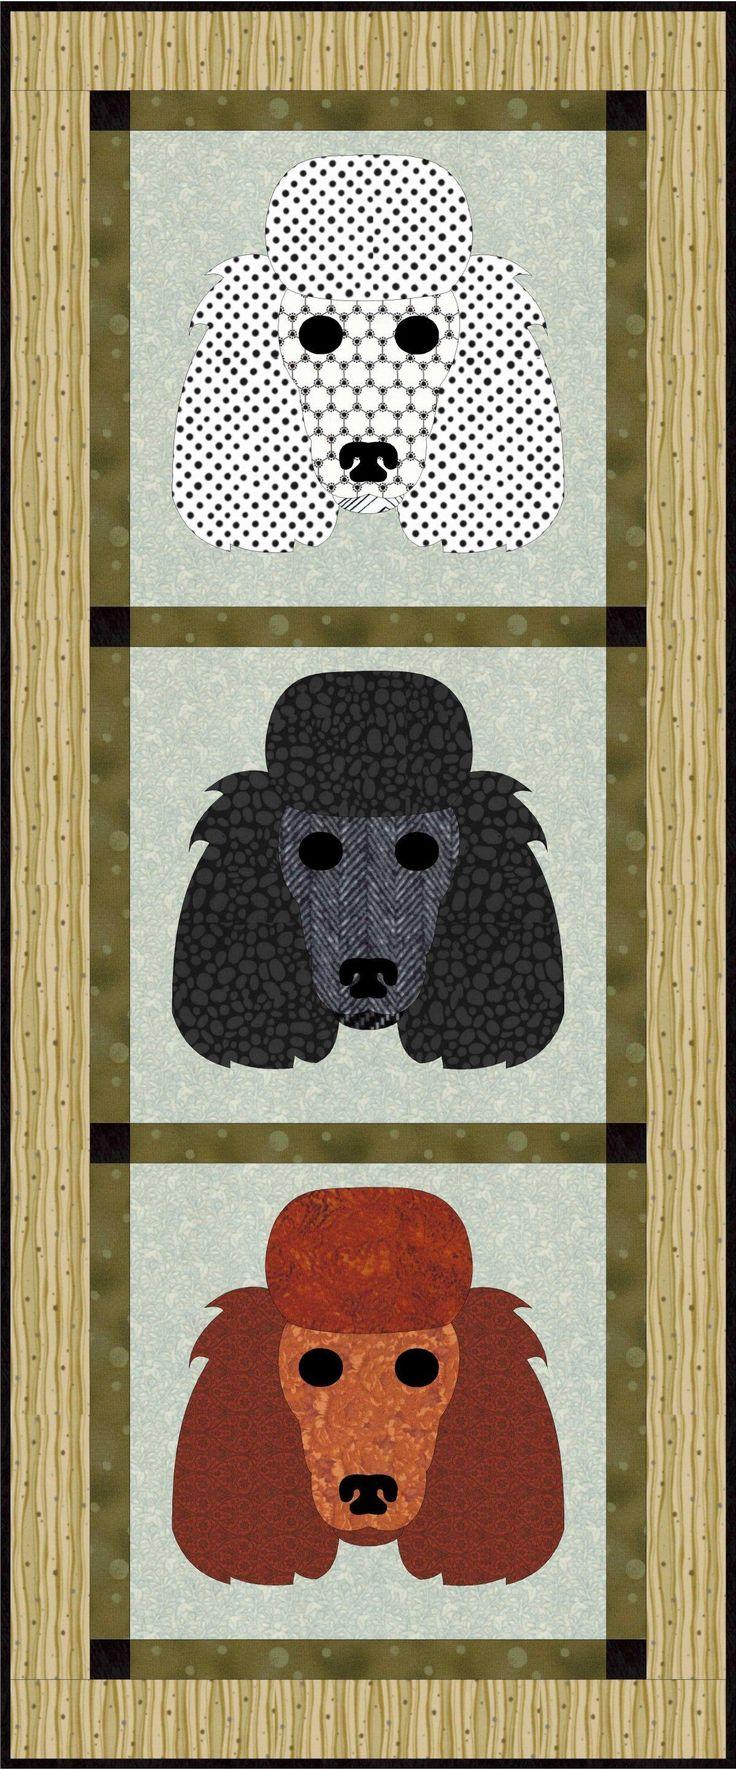 548 Best Oodles Of Them Poodles Images On Pinterest